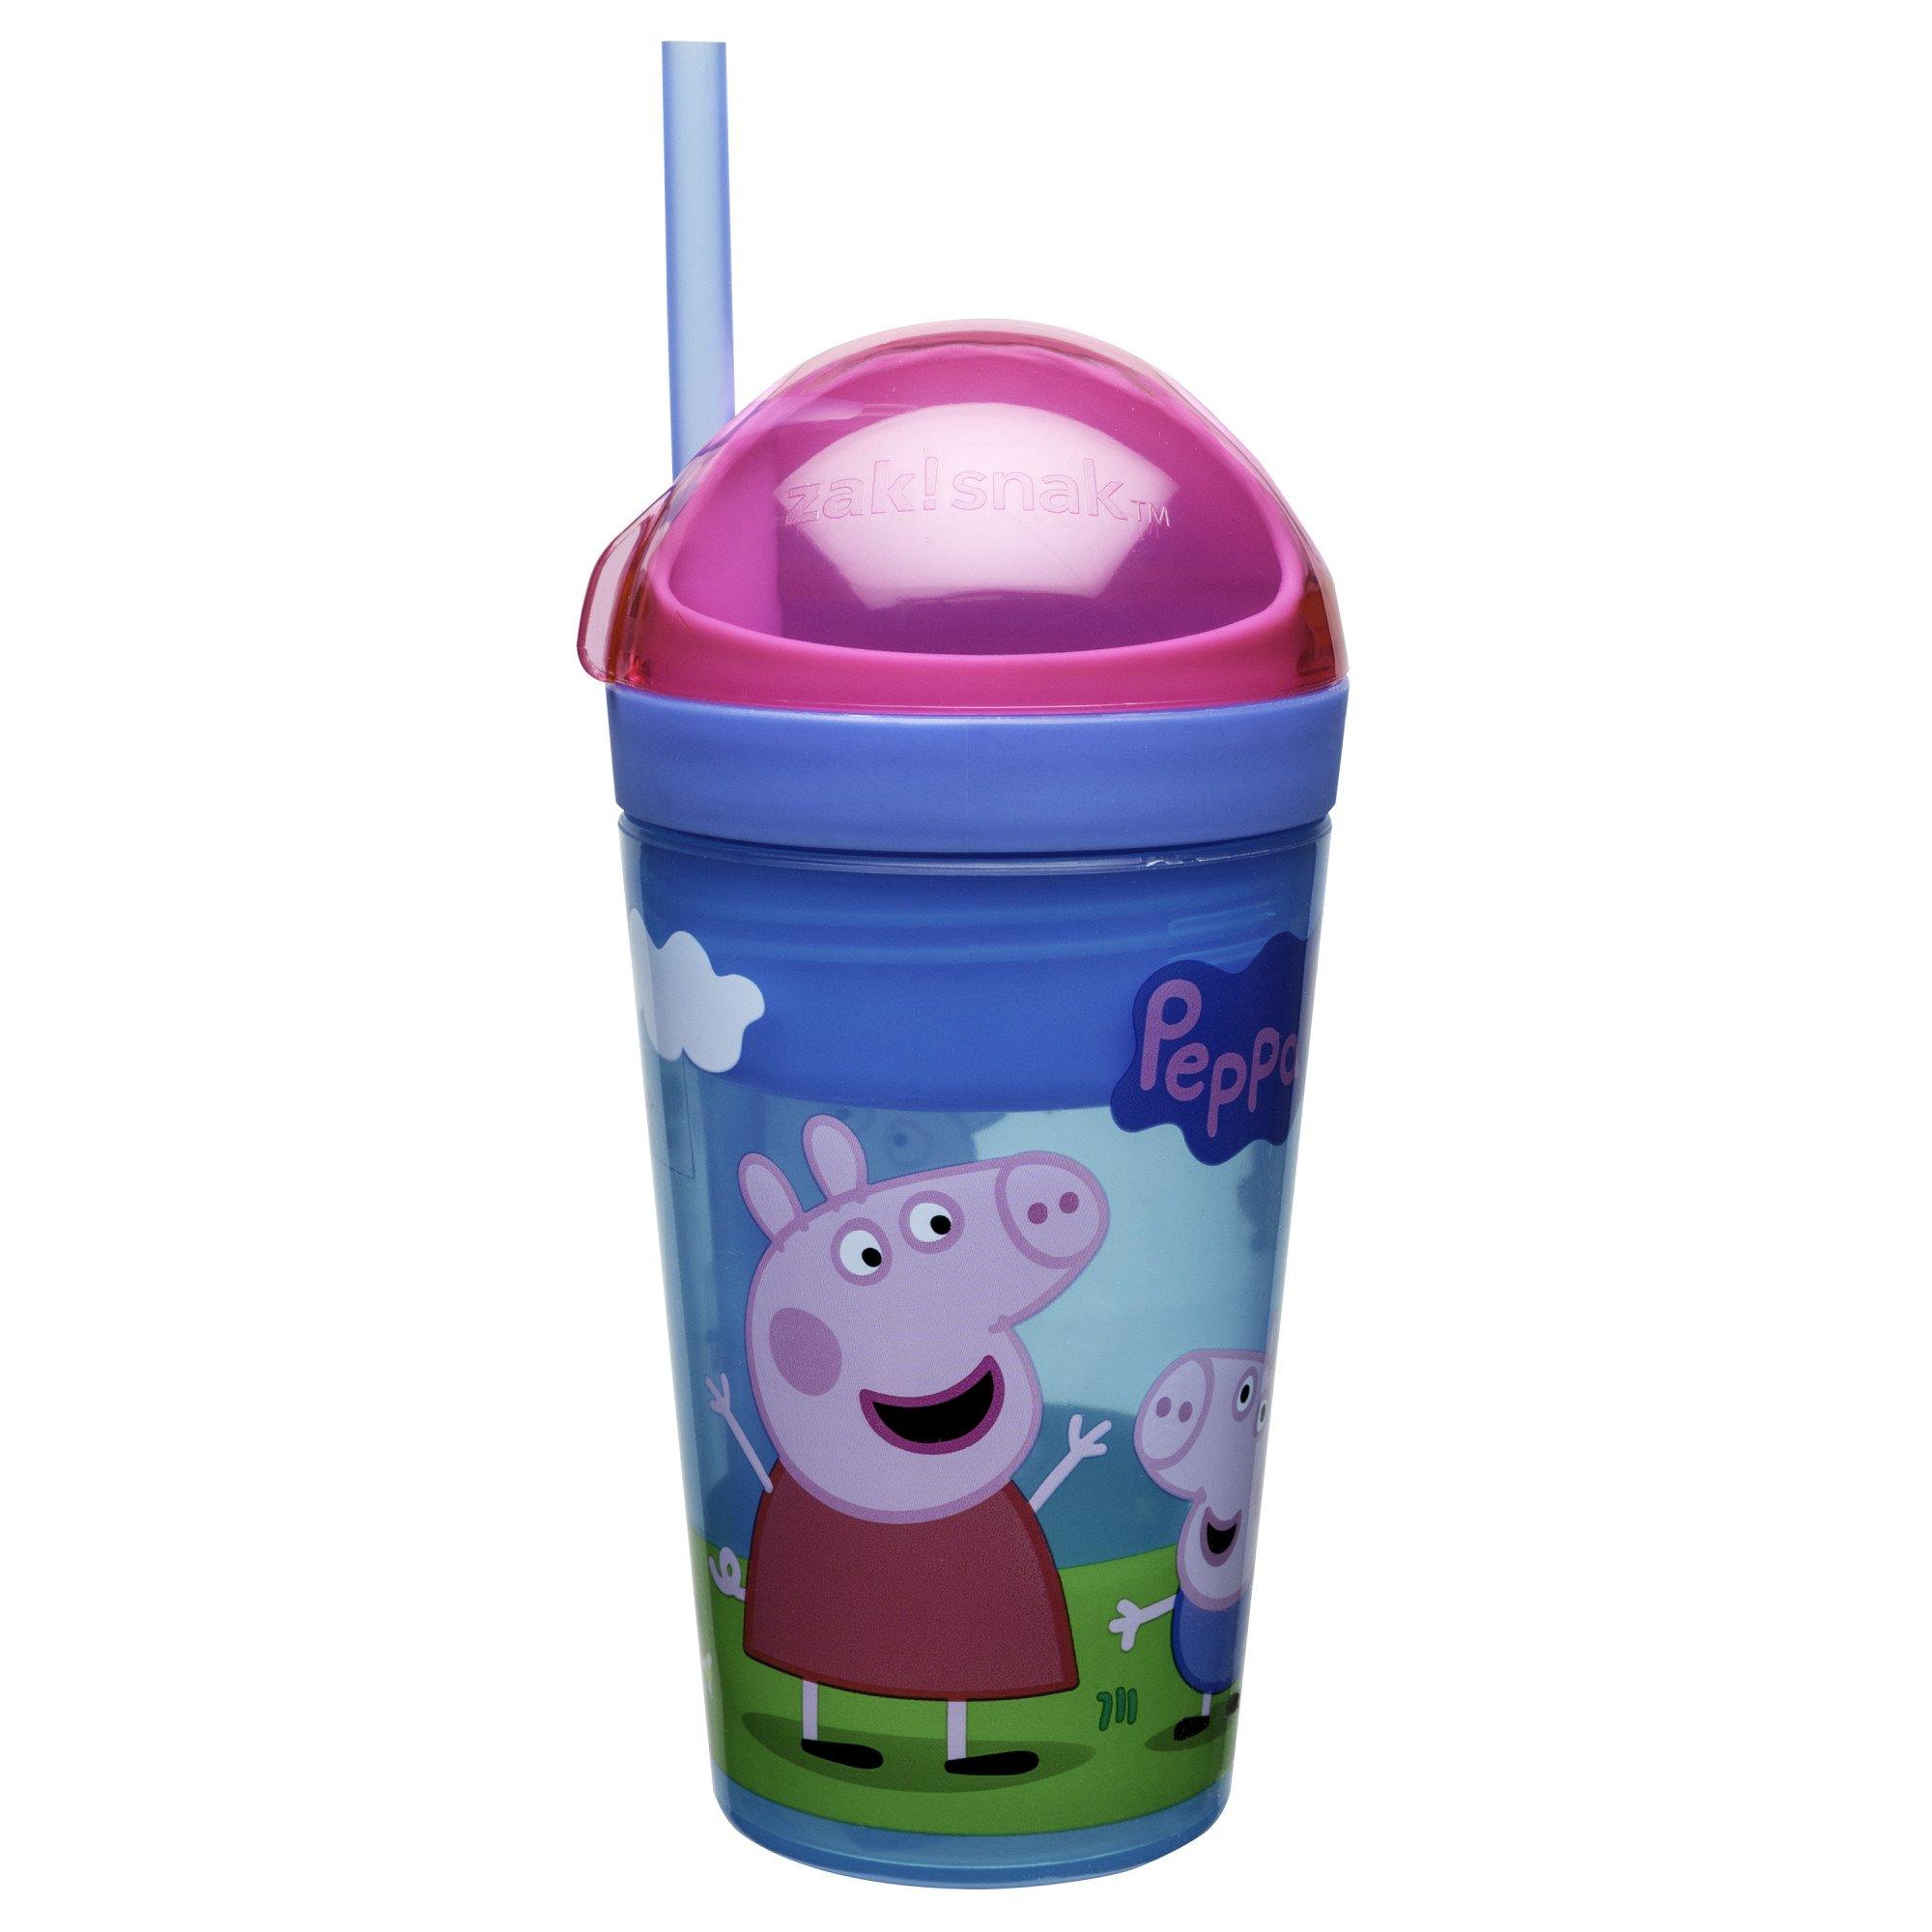 Zak Designs Peppa Pig ZakSnak All-In-One Drink